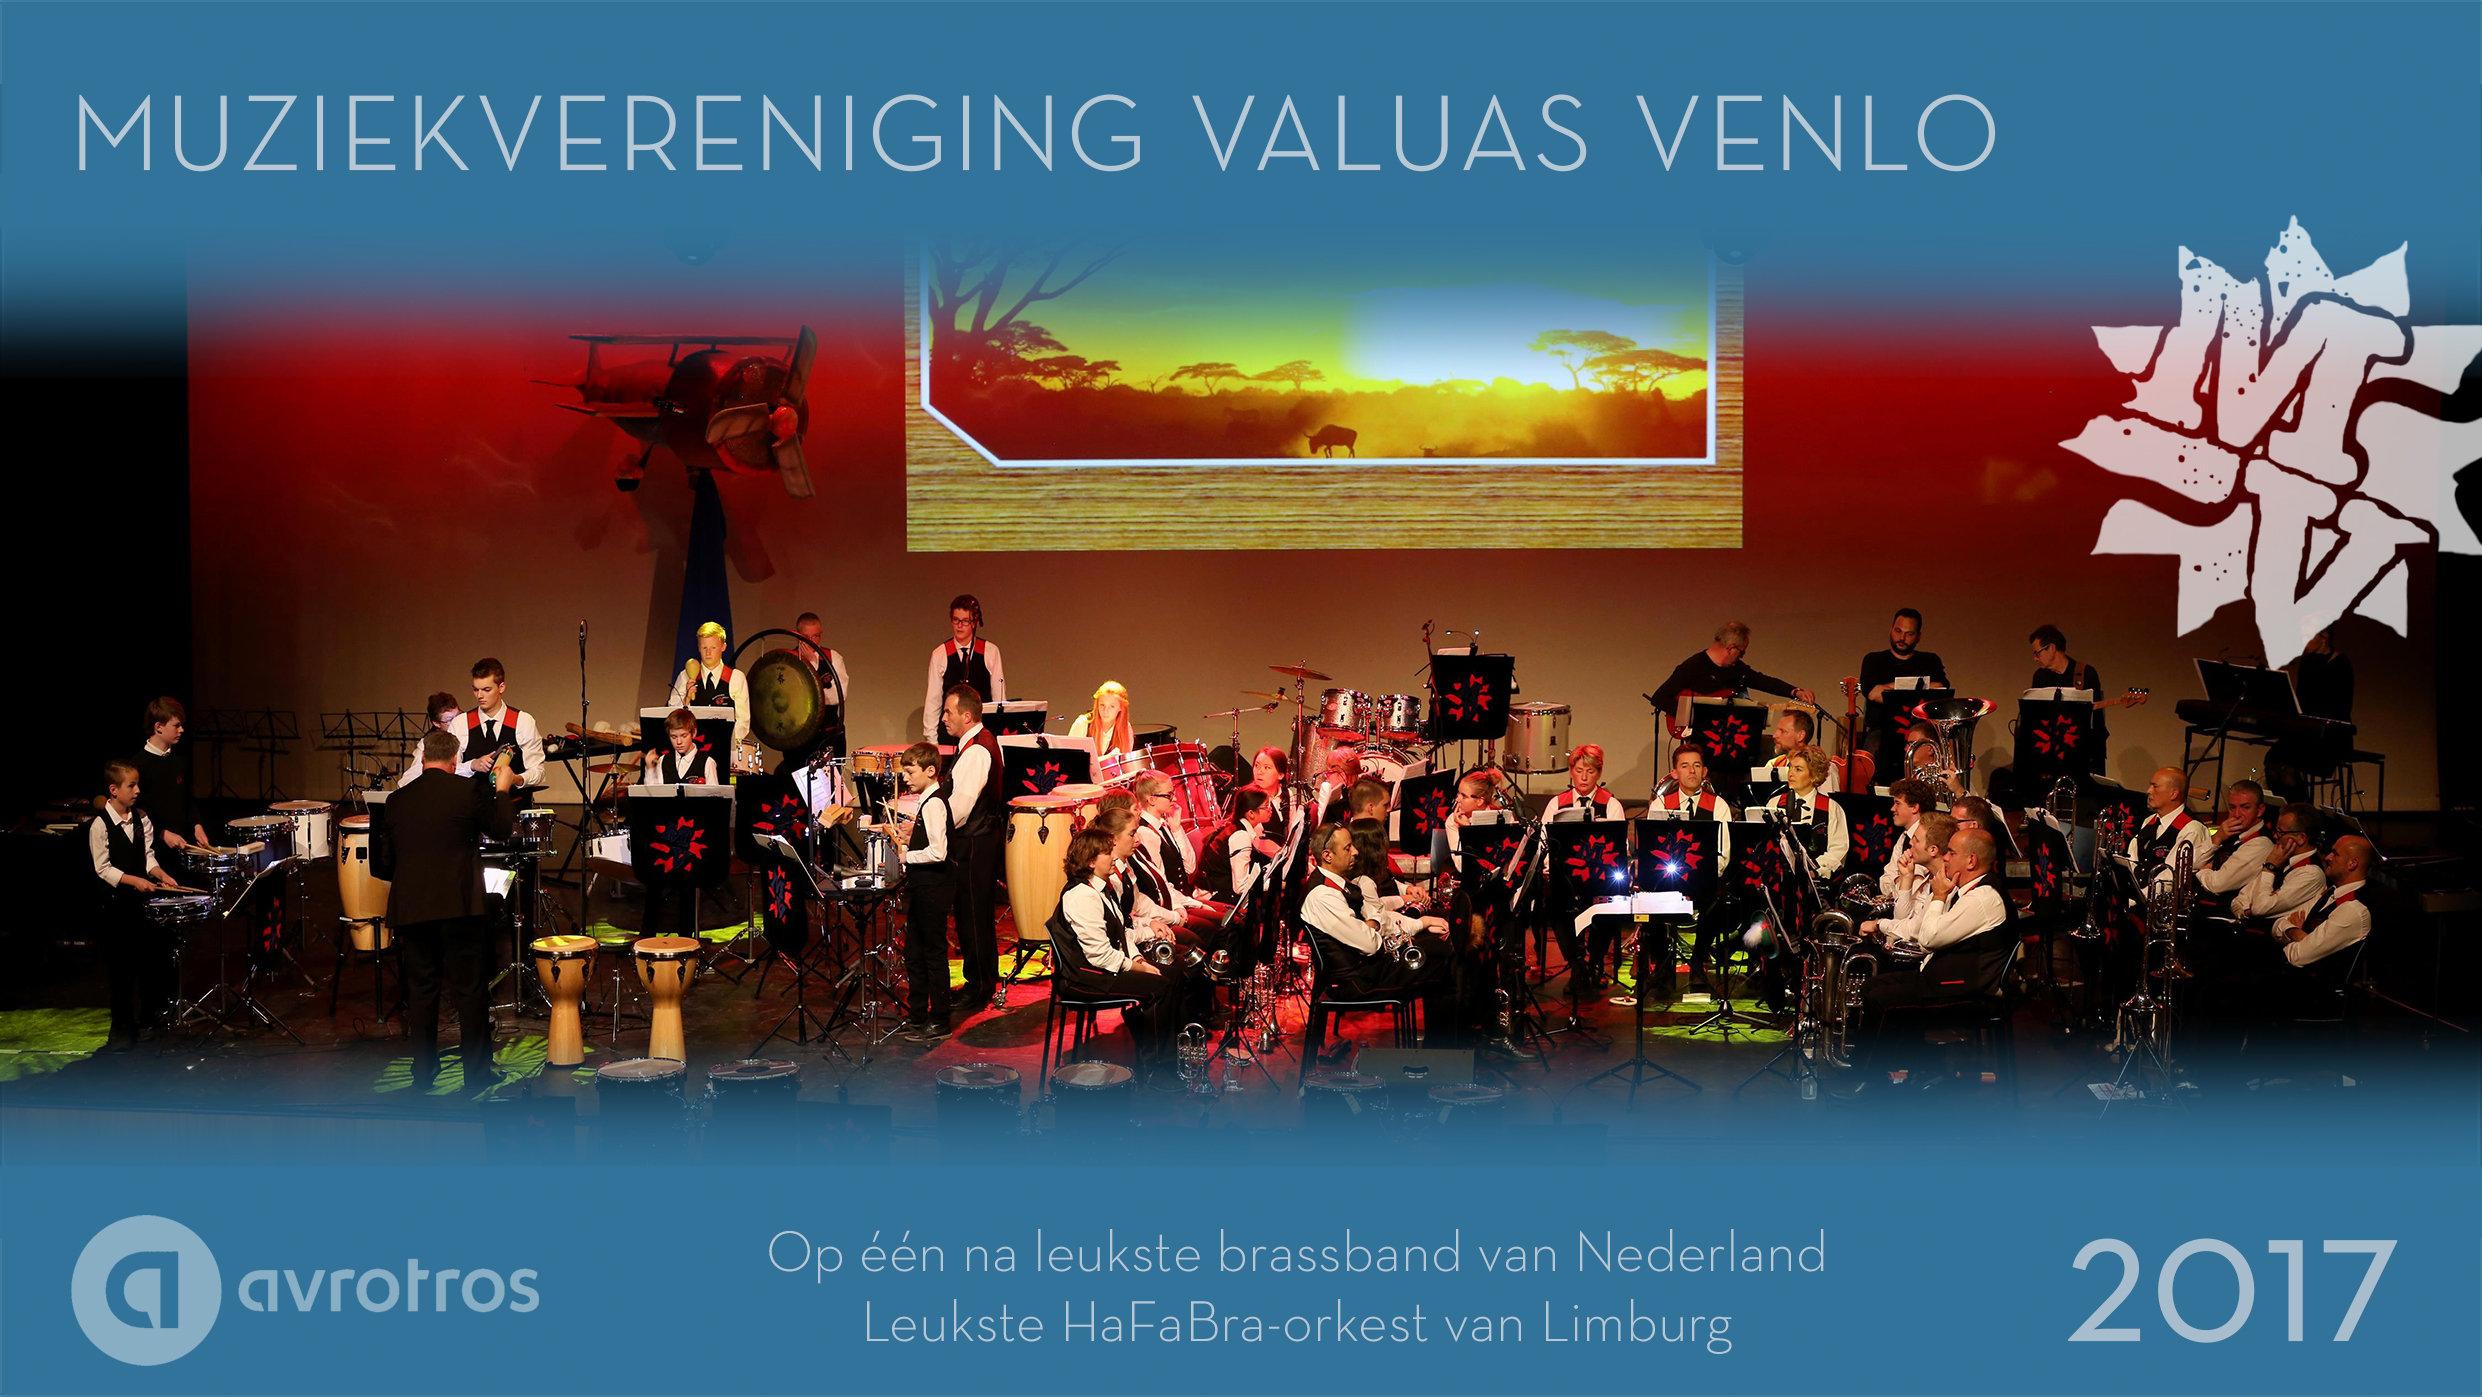 MV Valuas nominatie